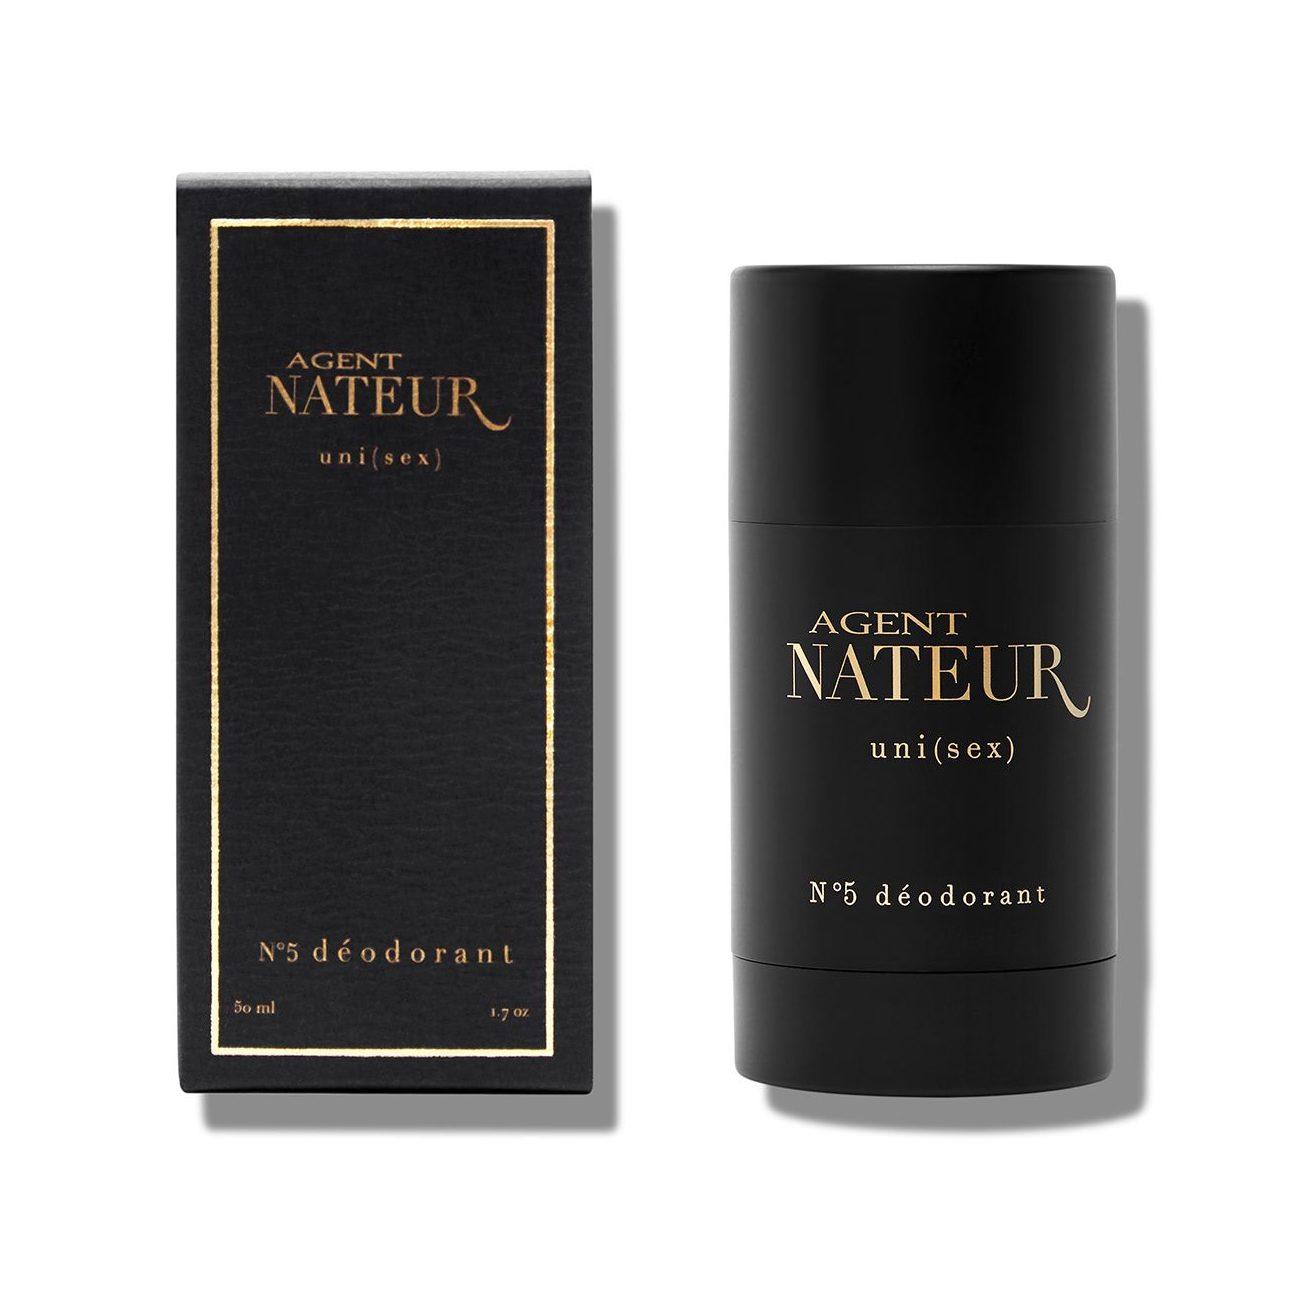 AGENT NATEUR Unisex No.5 Dezodorant naturalny | SoBio Beauty Boutique 2